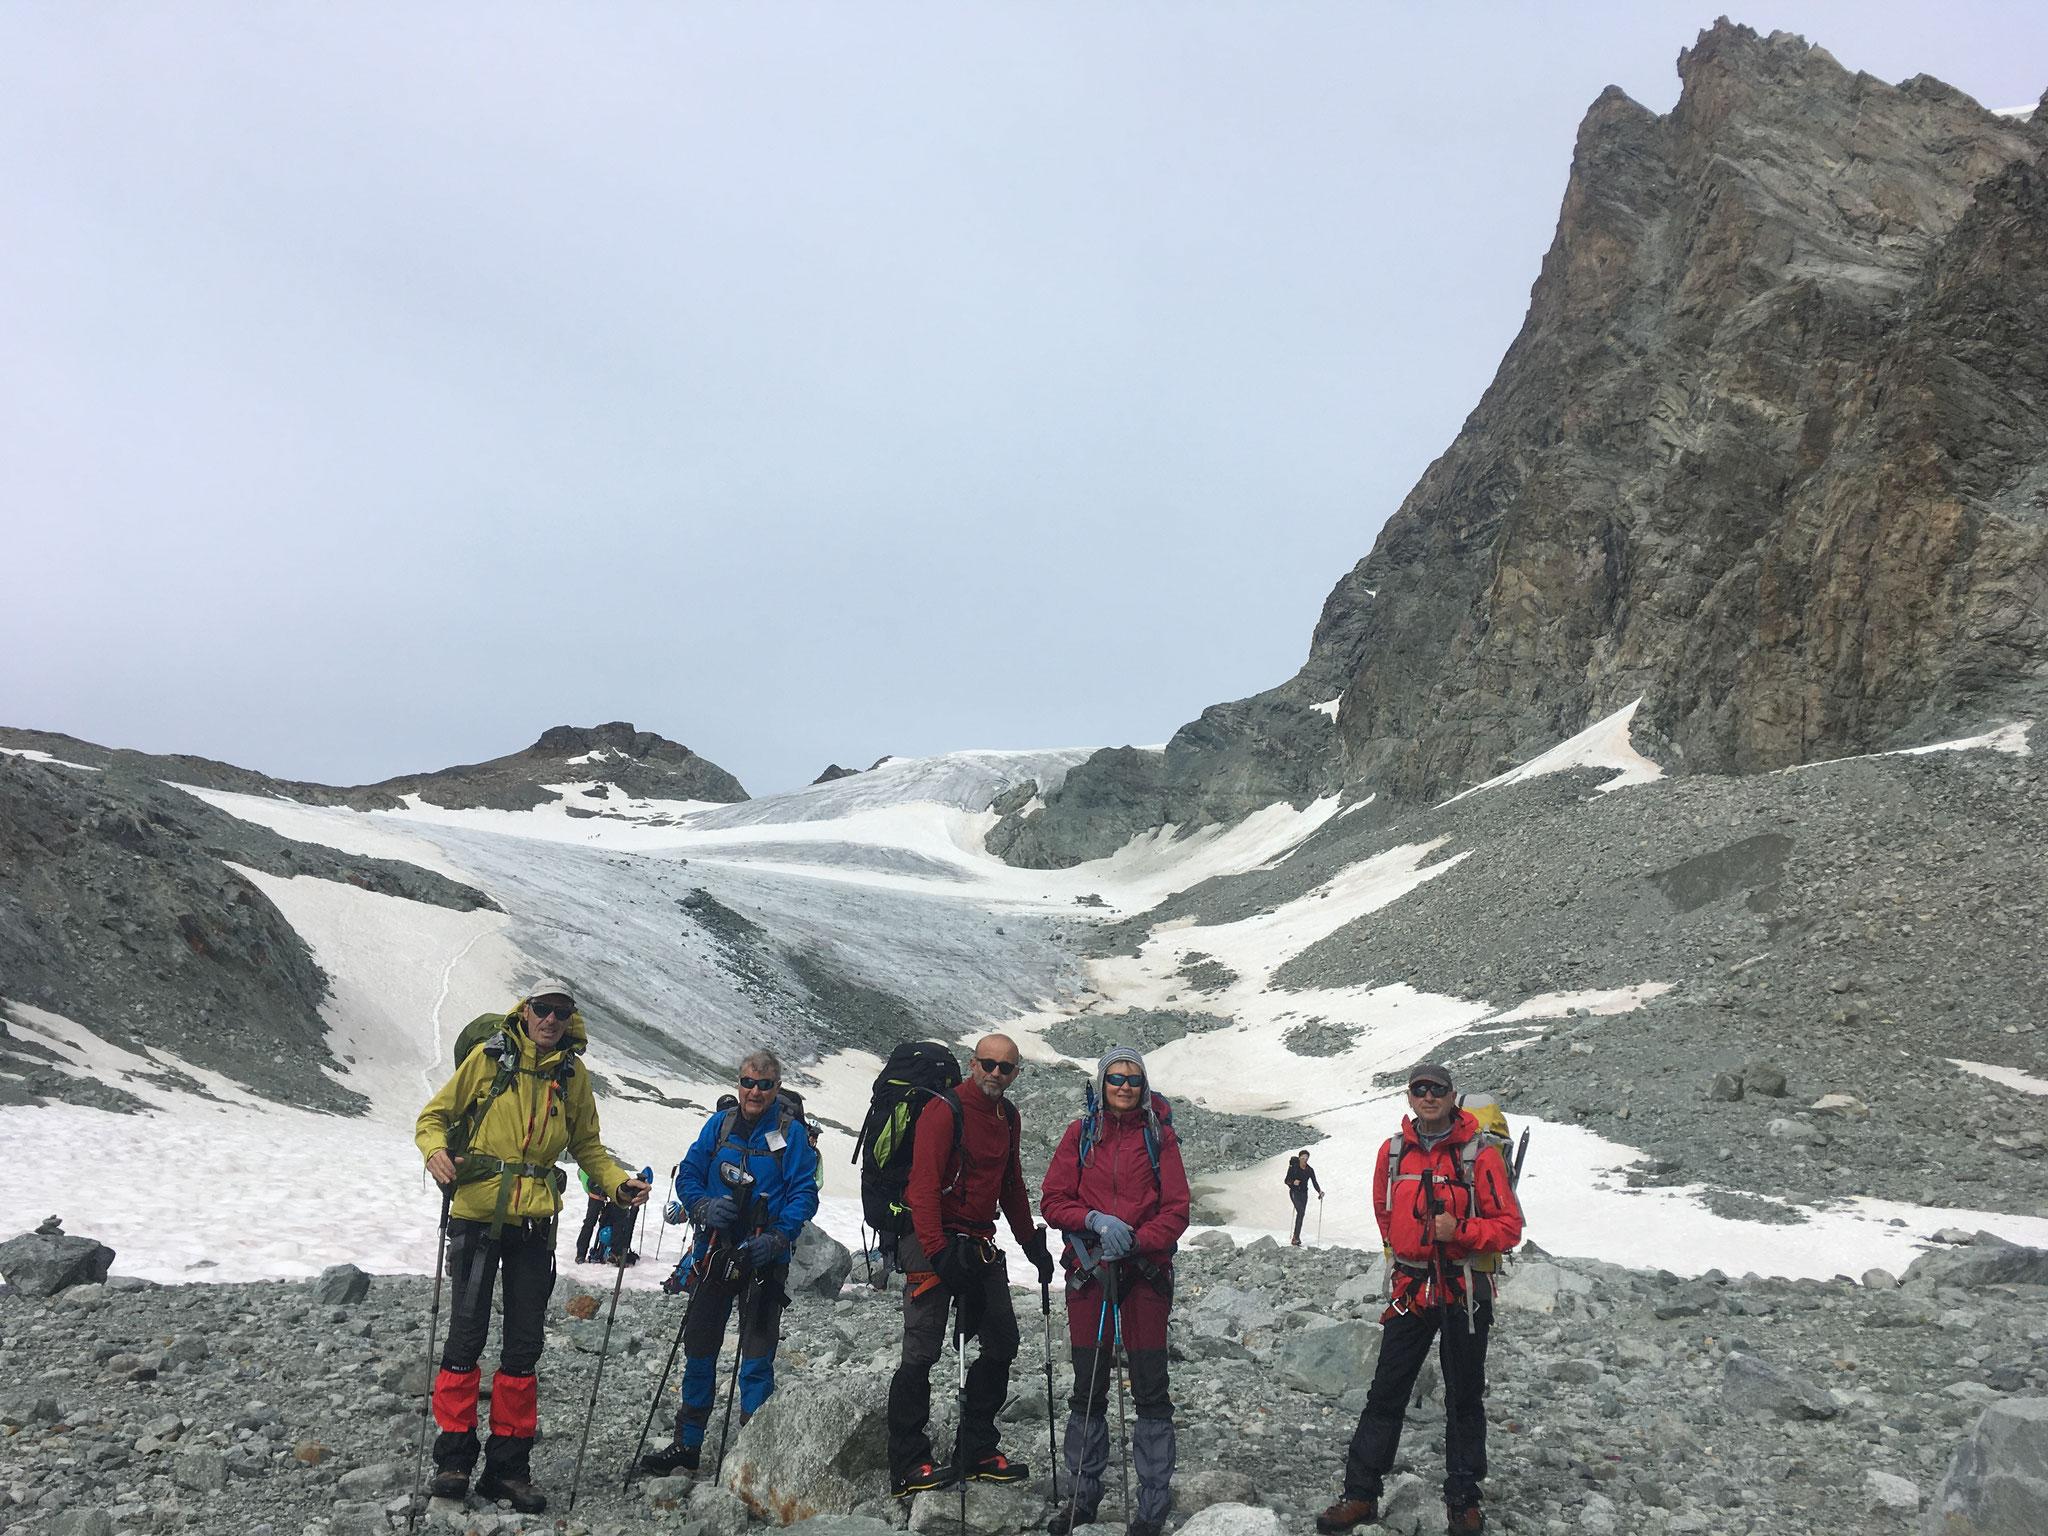 En descendant sur le Glacier d'Arolla